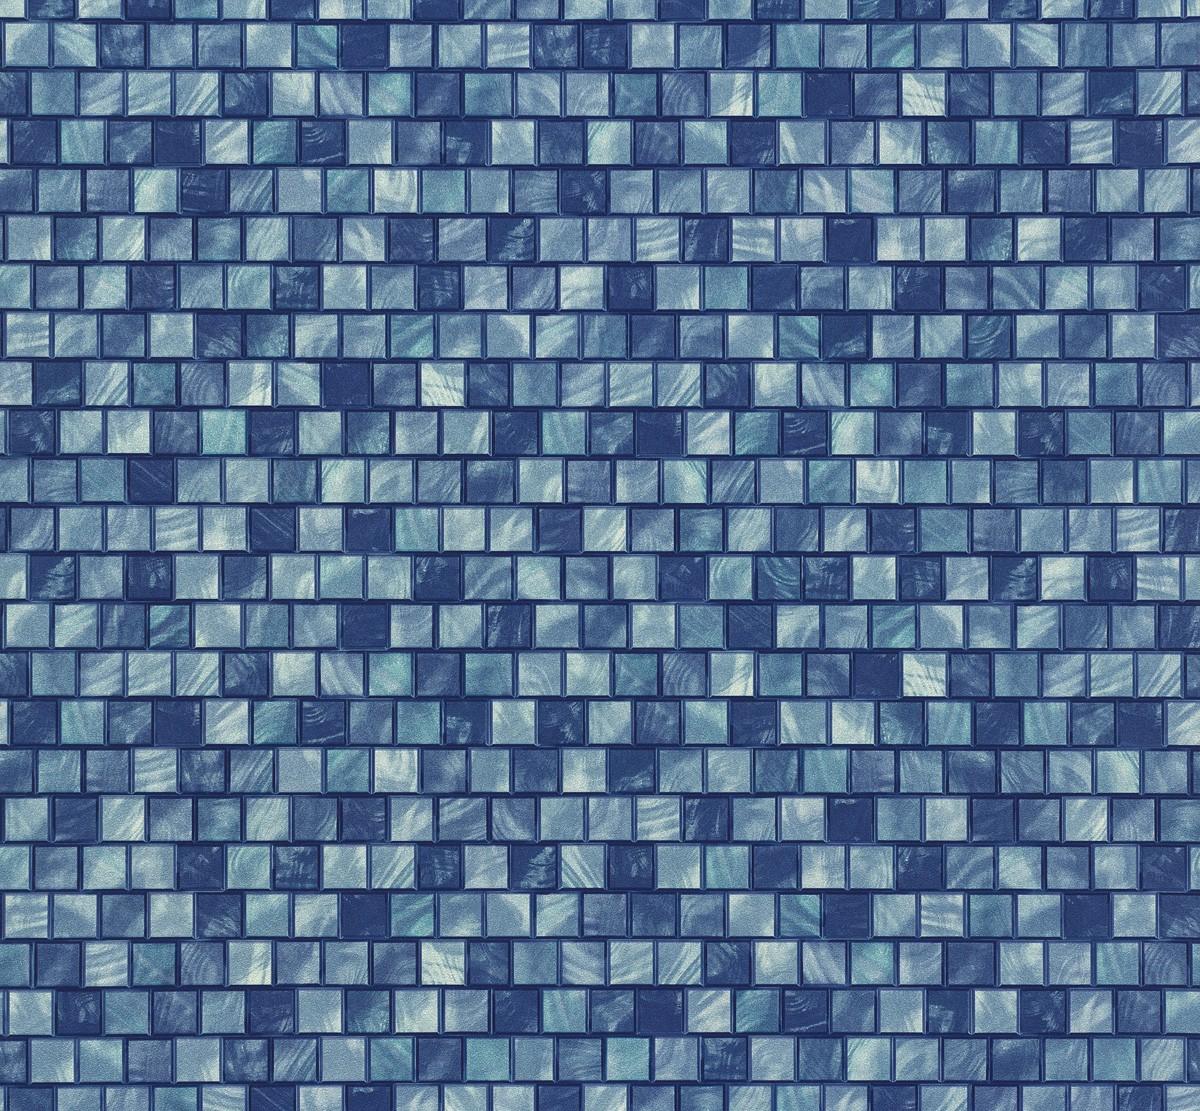 vliestapete mosaik blau p s origin 42103 10